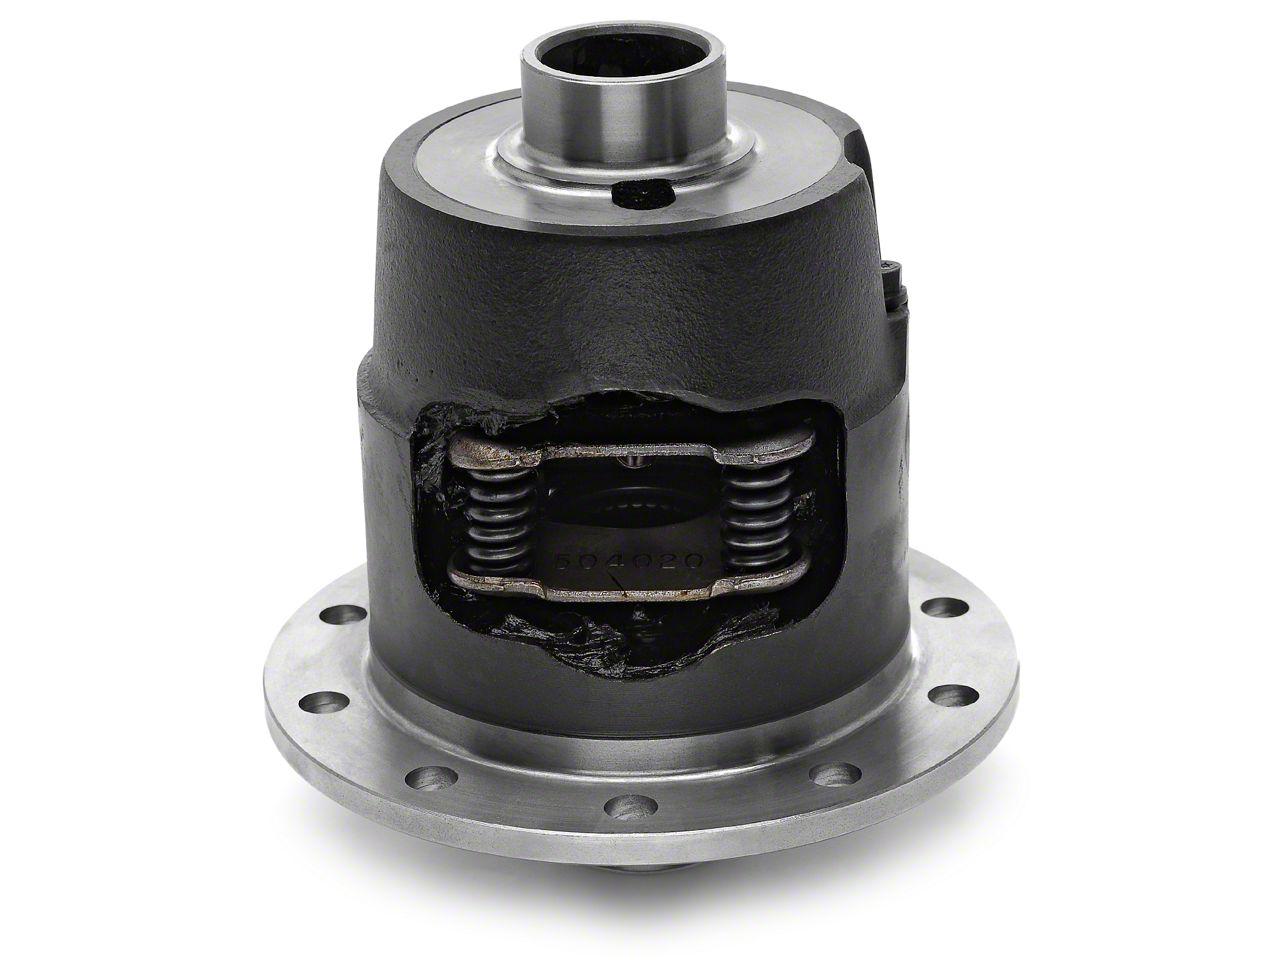 Auburn Gear Pro Series Limit Slip Differential - 31 Spline 8.8 in. (11-14 V6; 86-14 V8, Excluding 13-14 GT500)